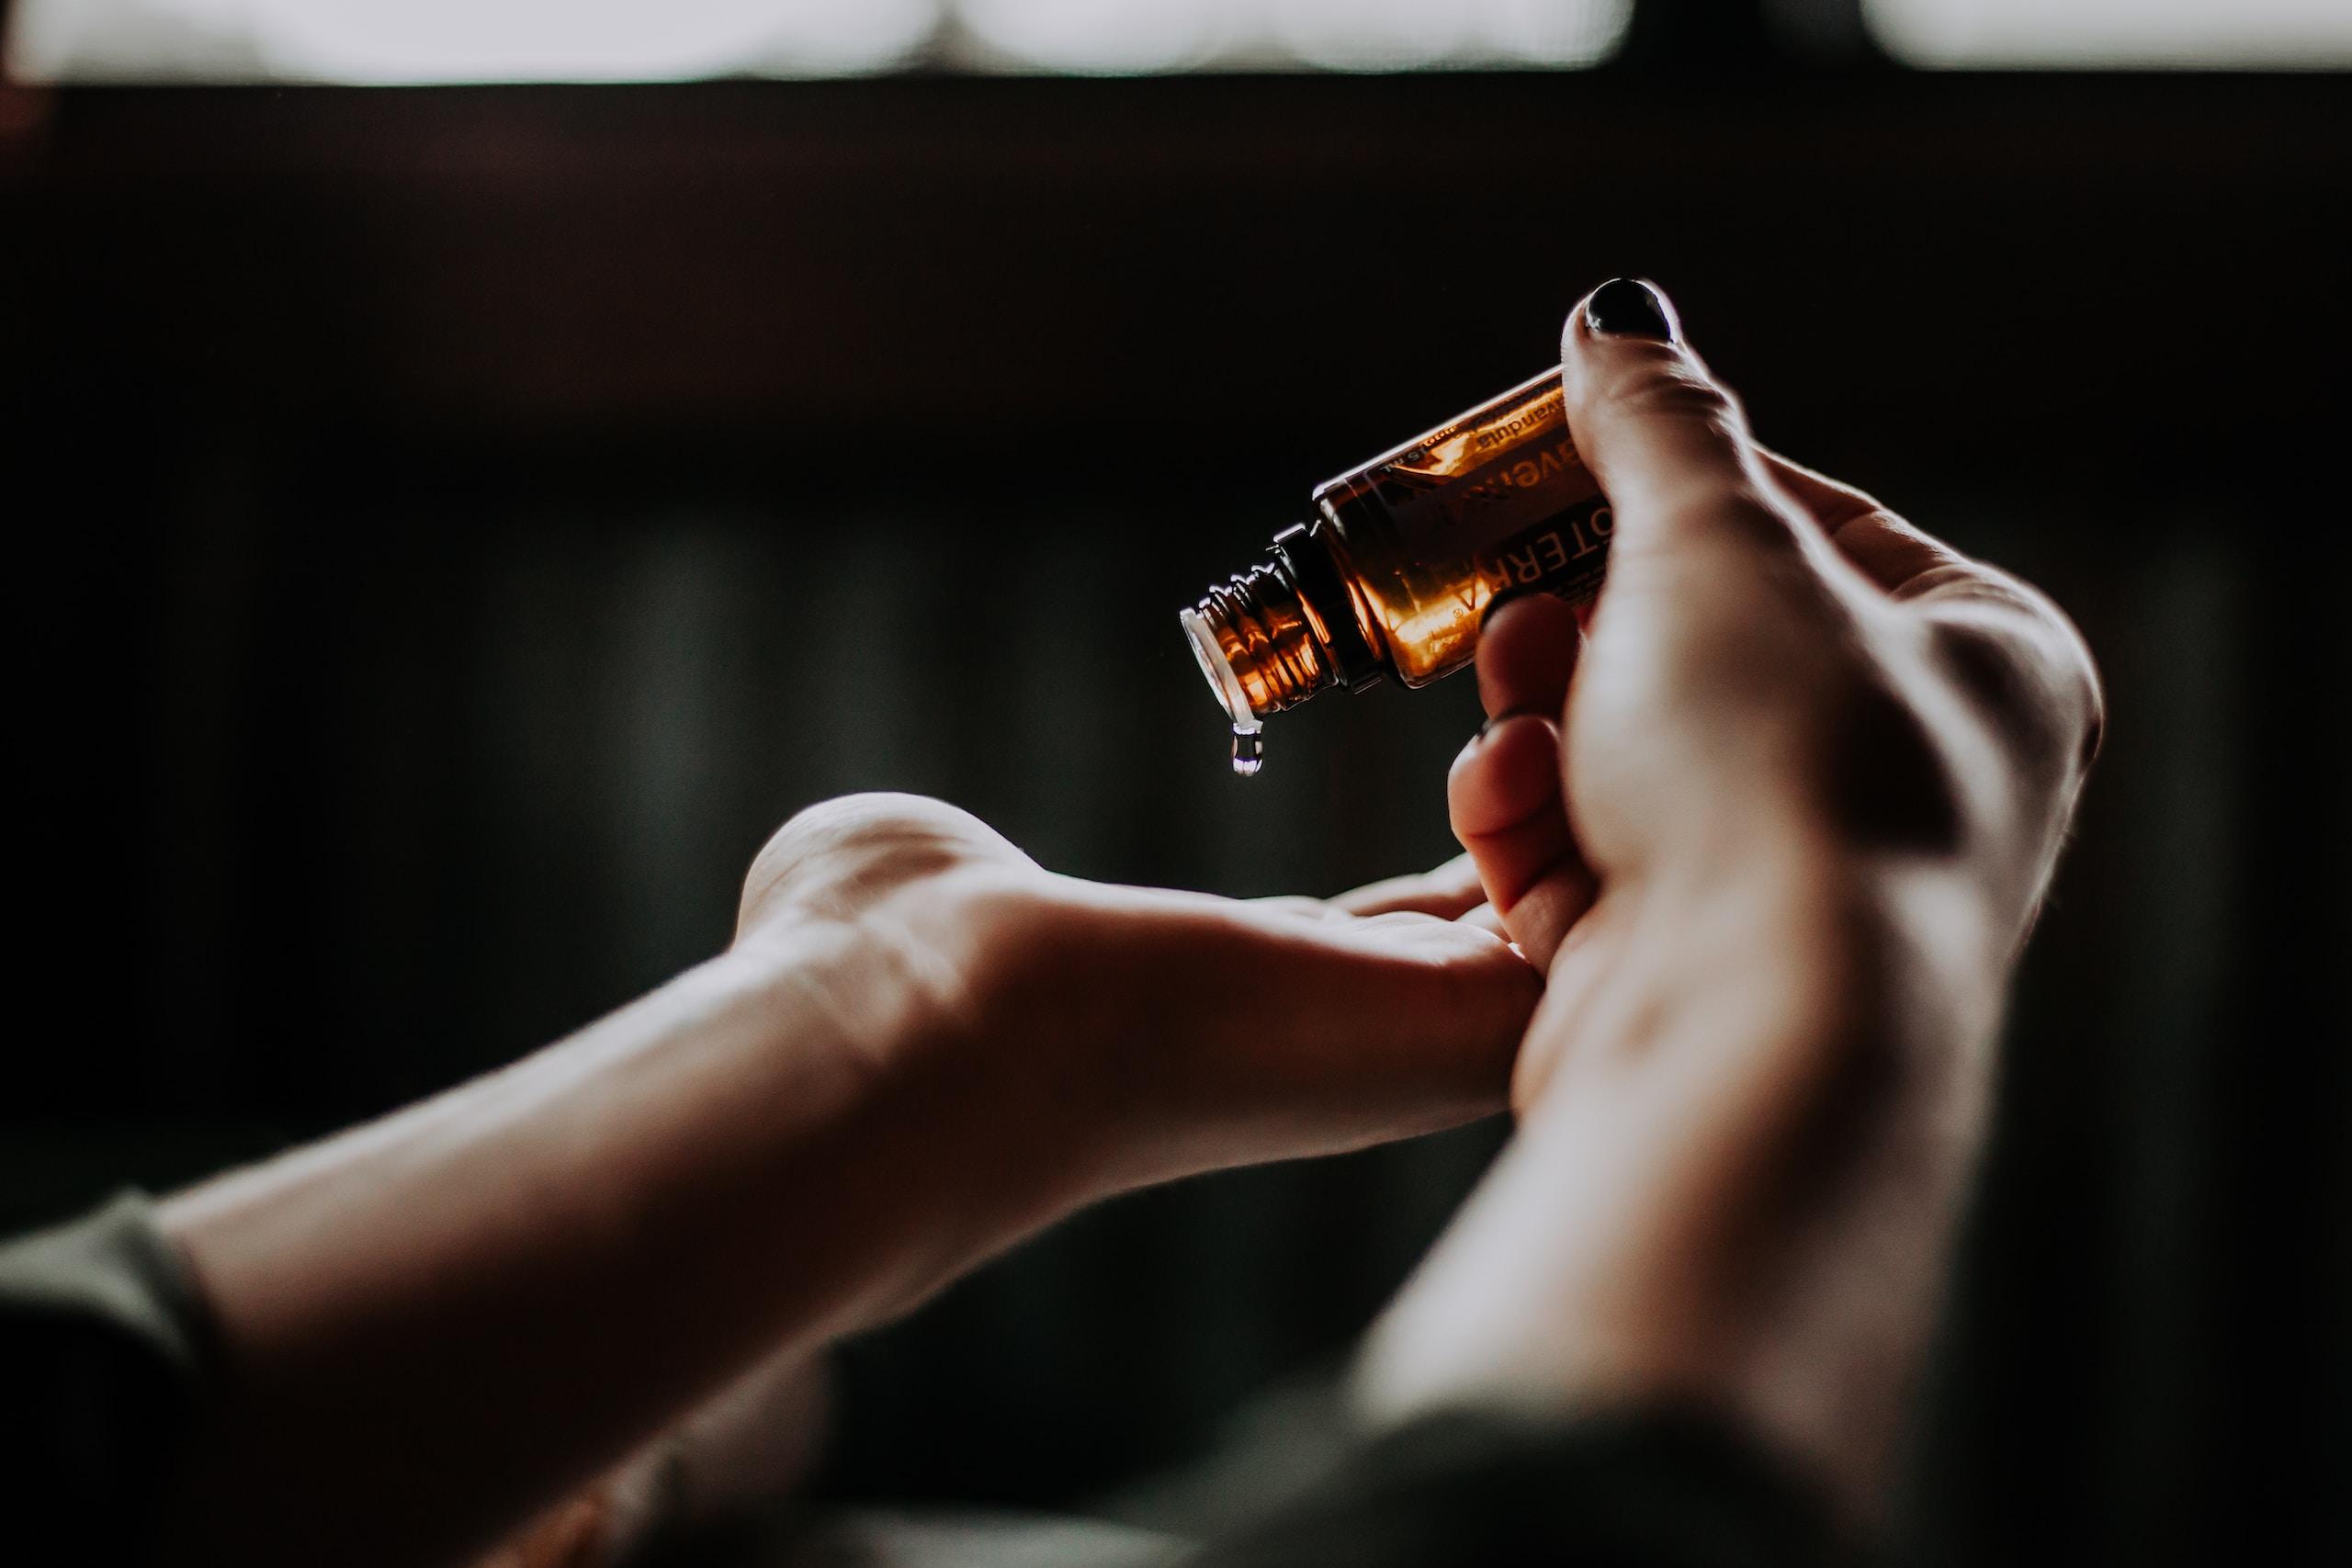 medicina tradicional, person holding amber glass bottle